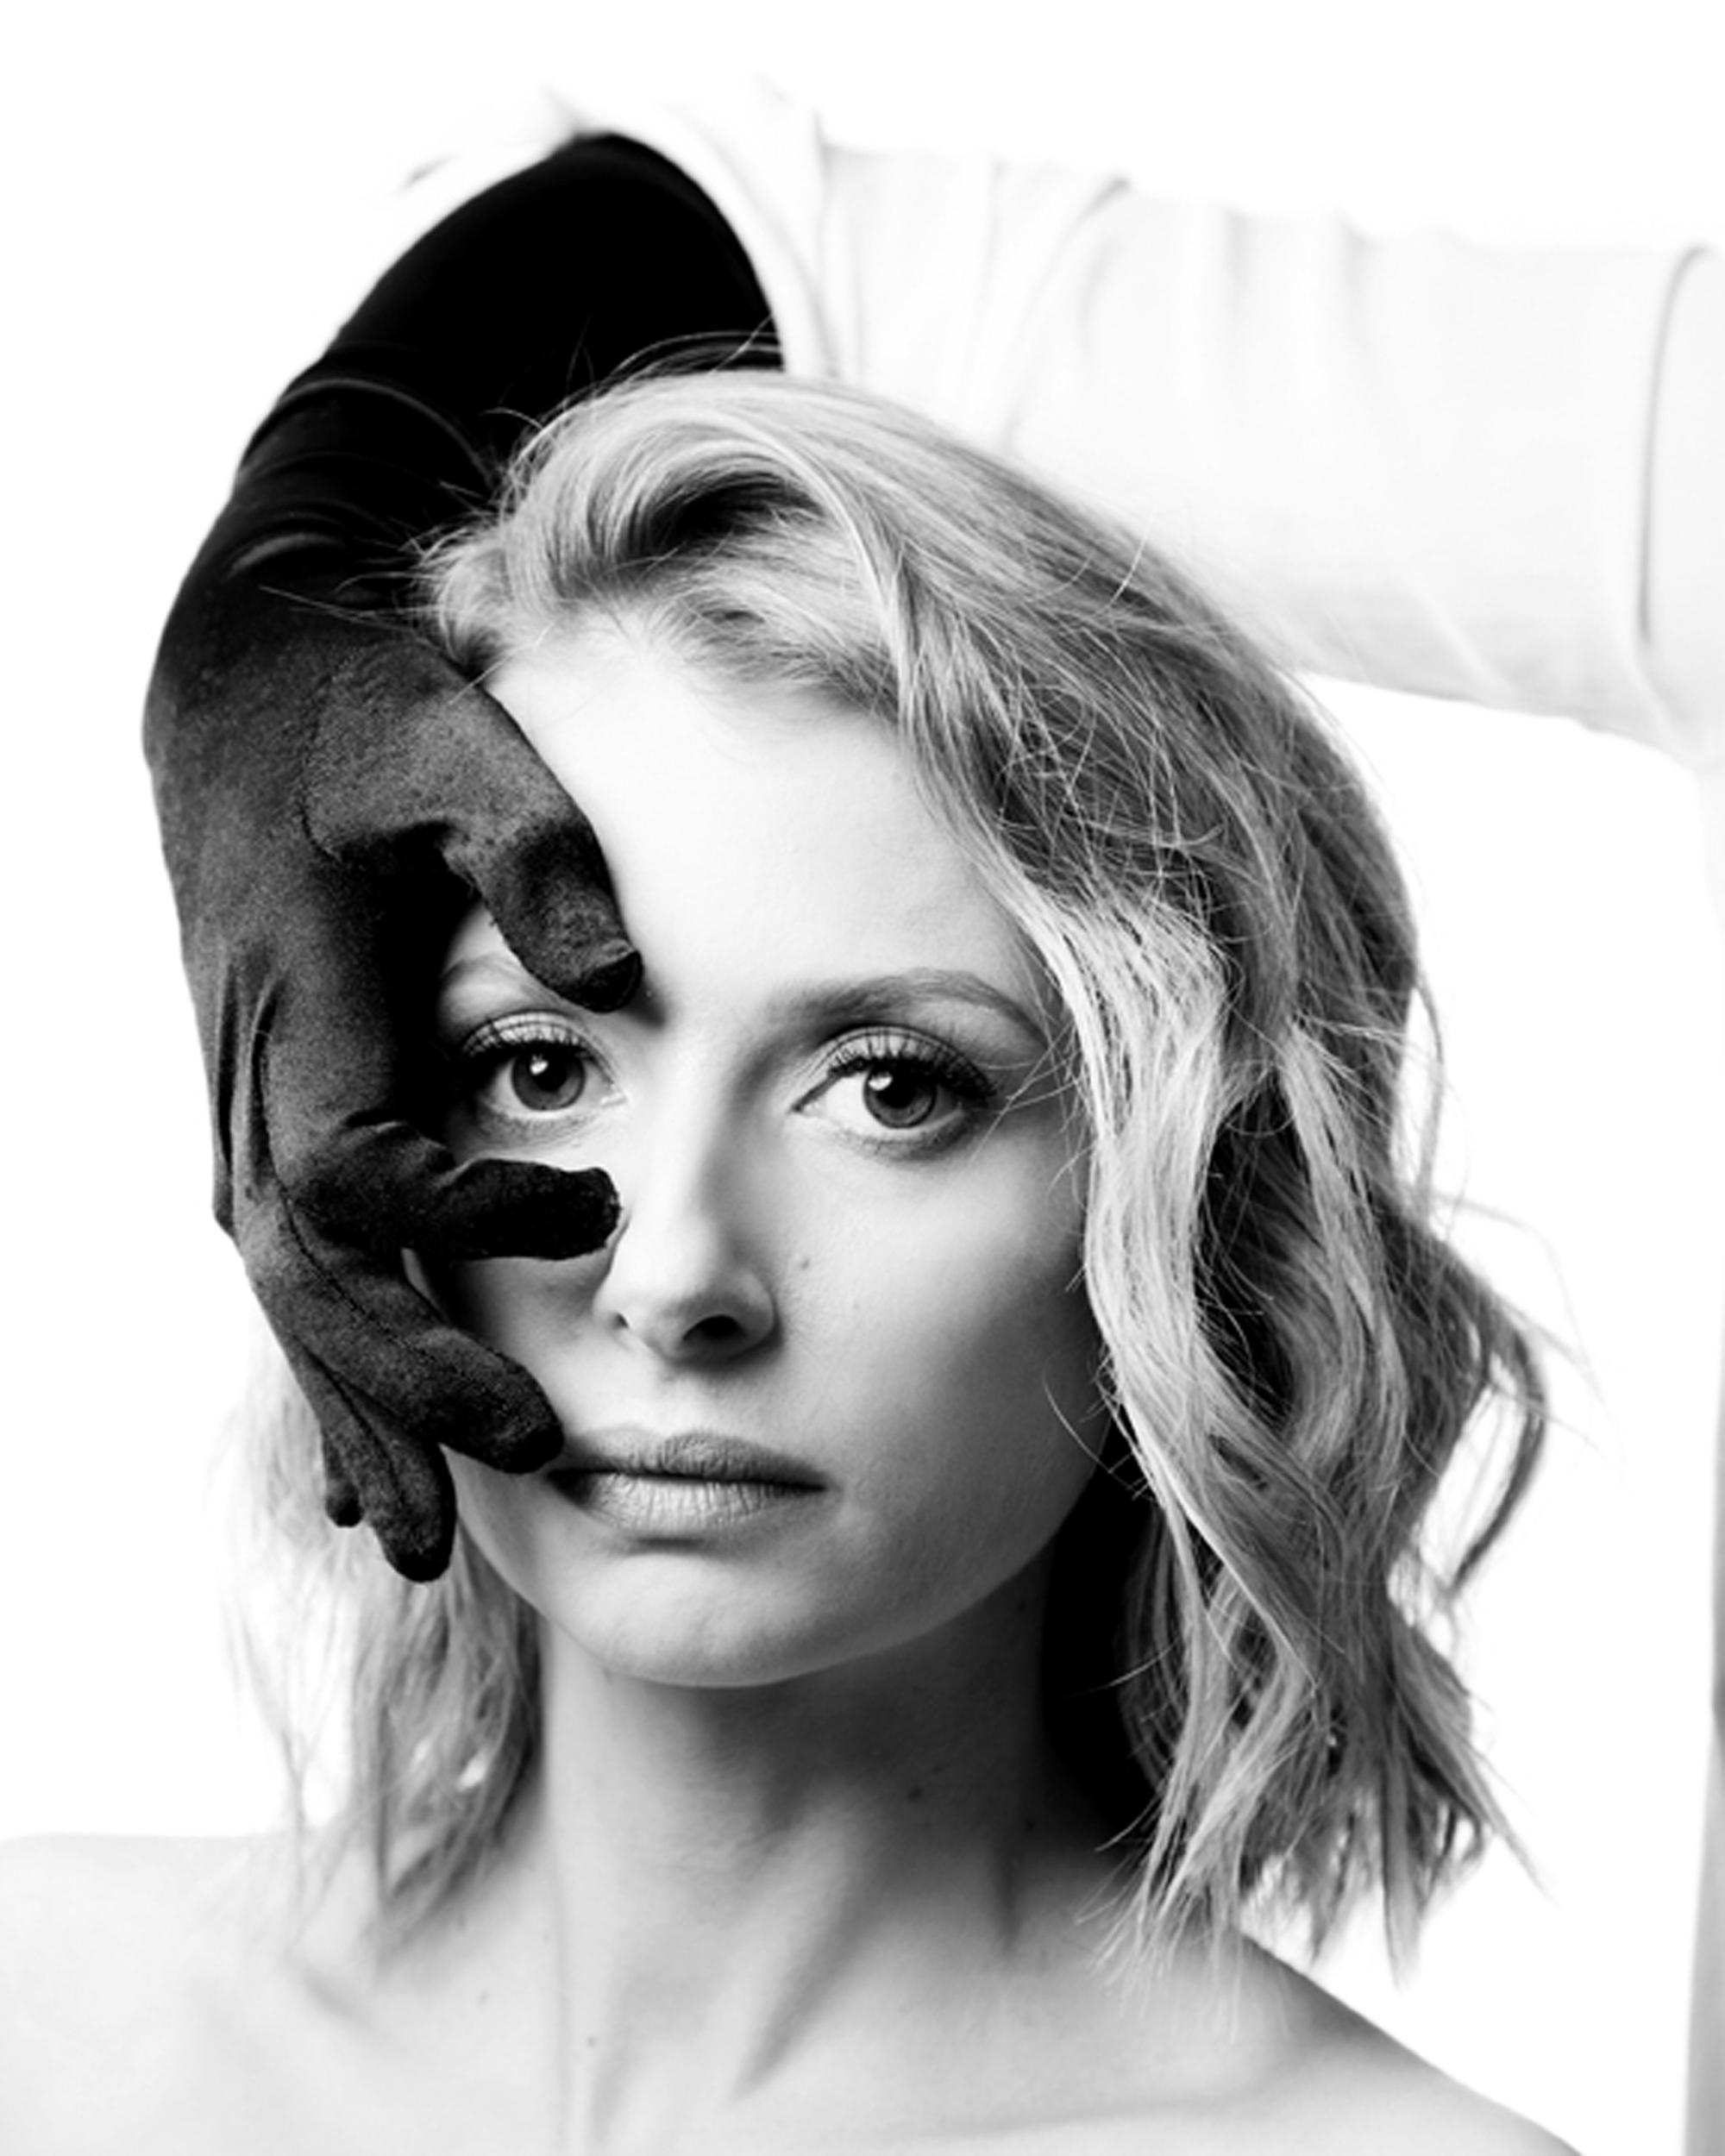 Portraits-Cihanbektas-7.jpg